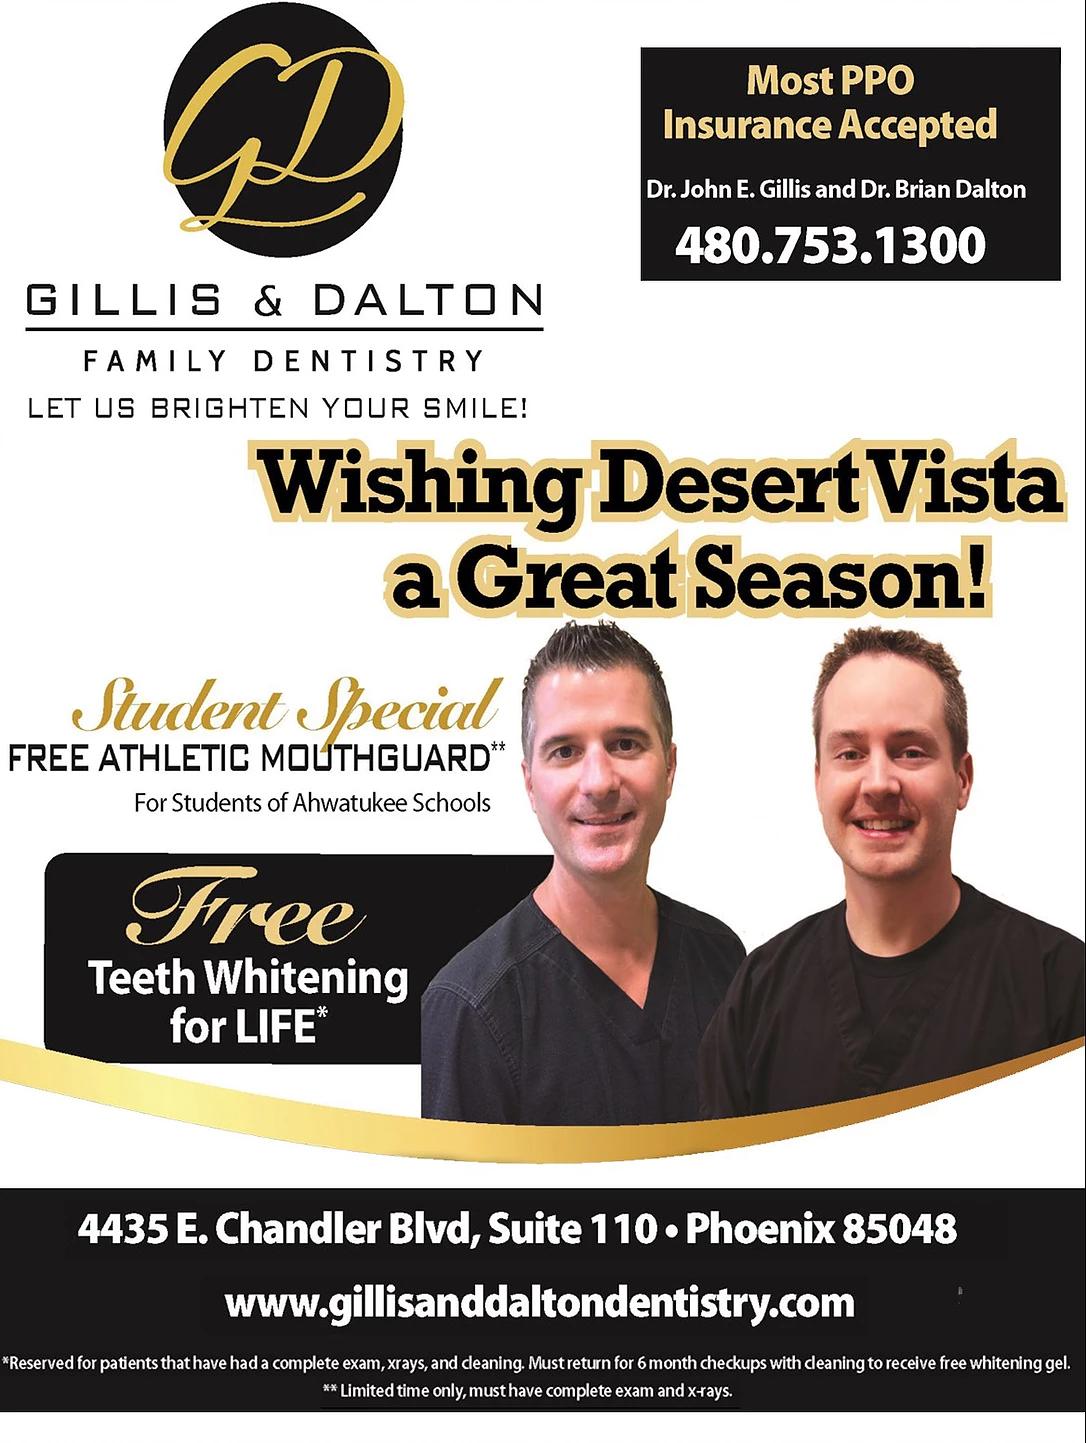 Gillis & Dalton Family Dentistry